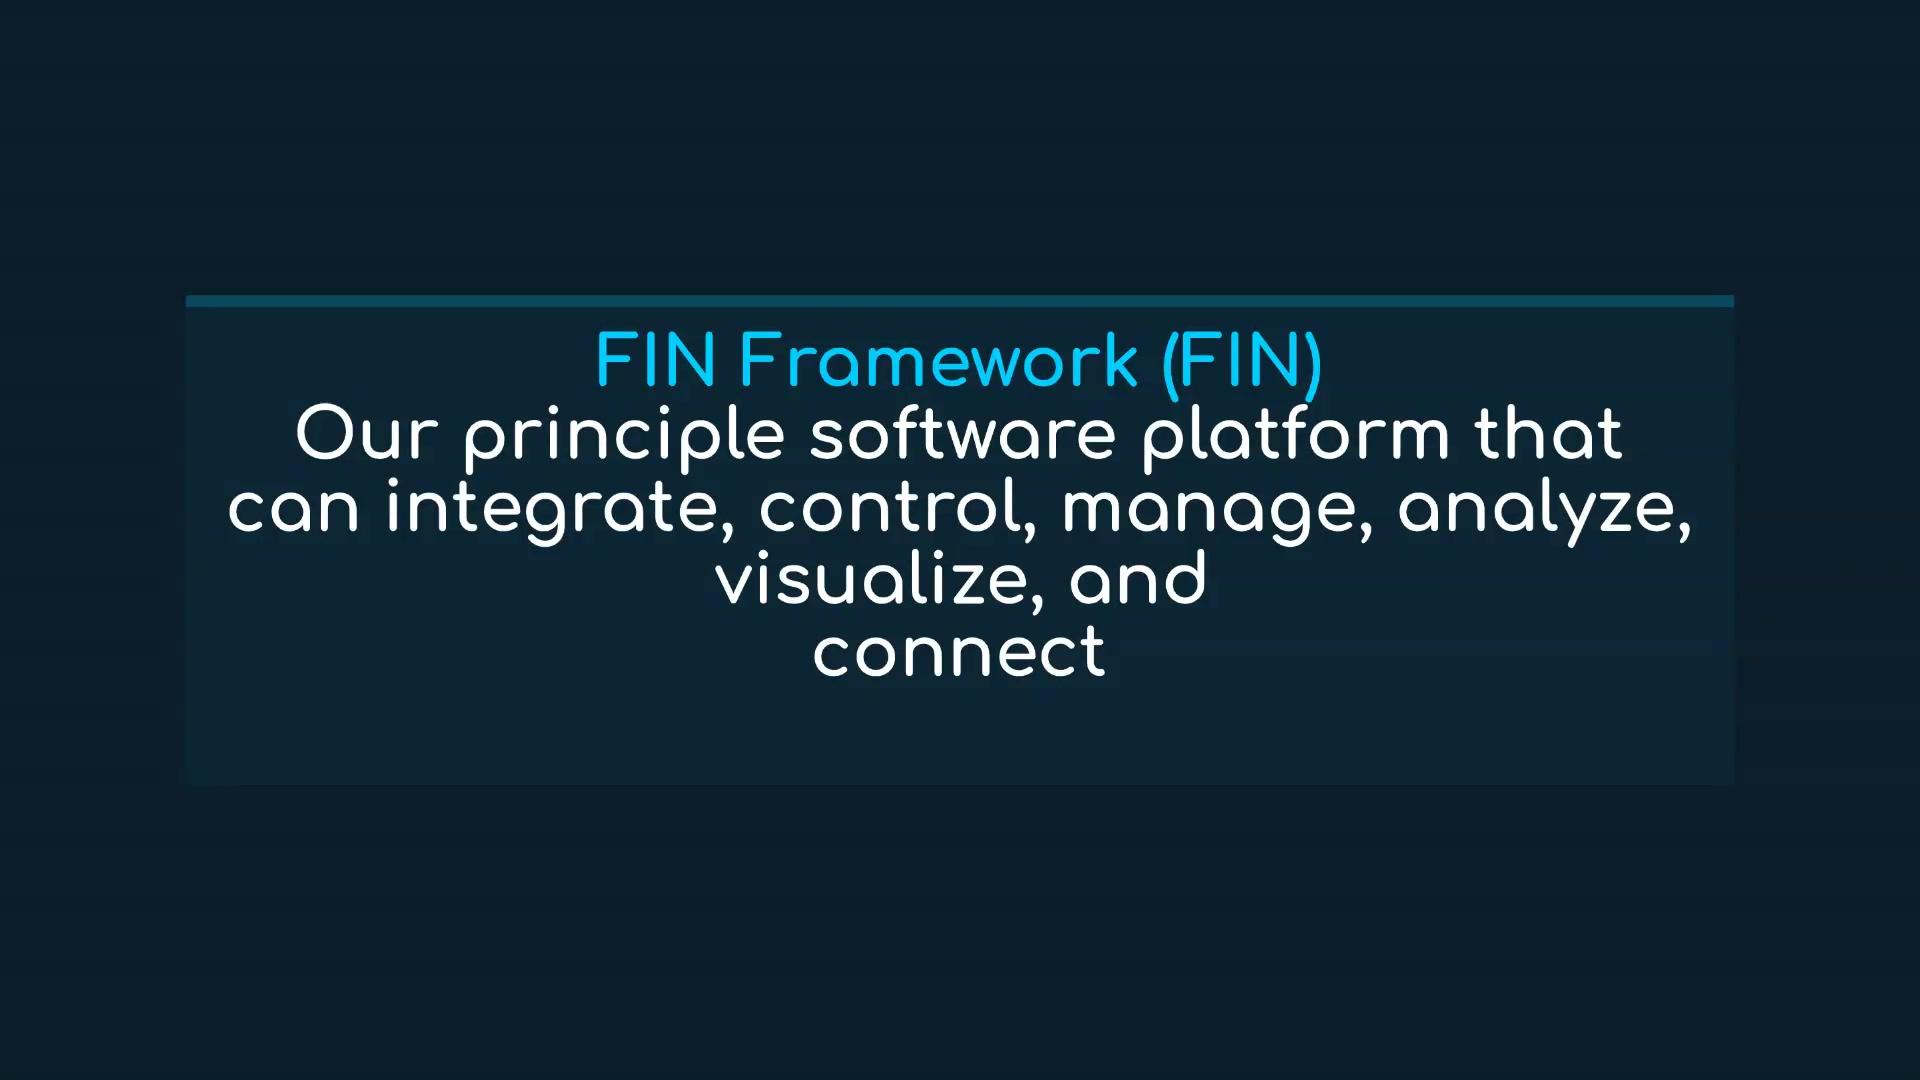 NEW_Branding_FIN_Framework overview